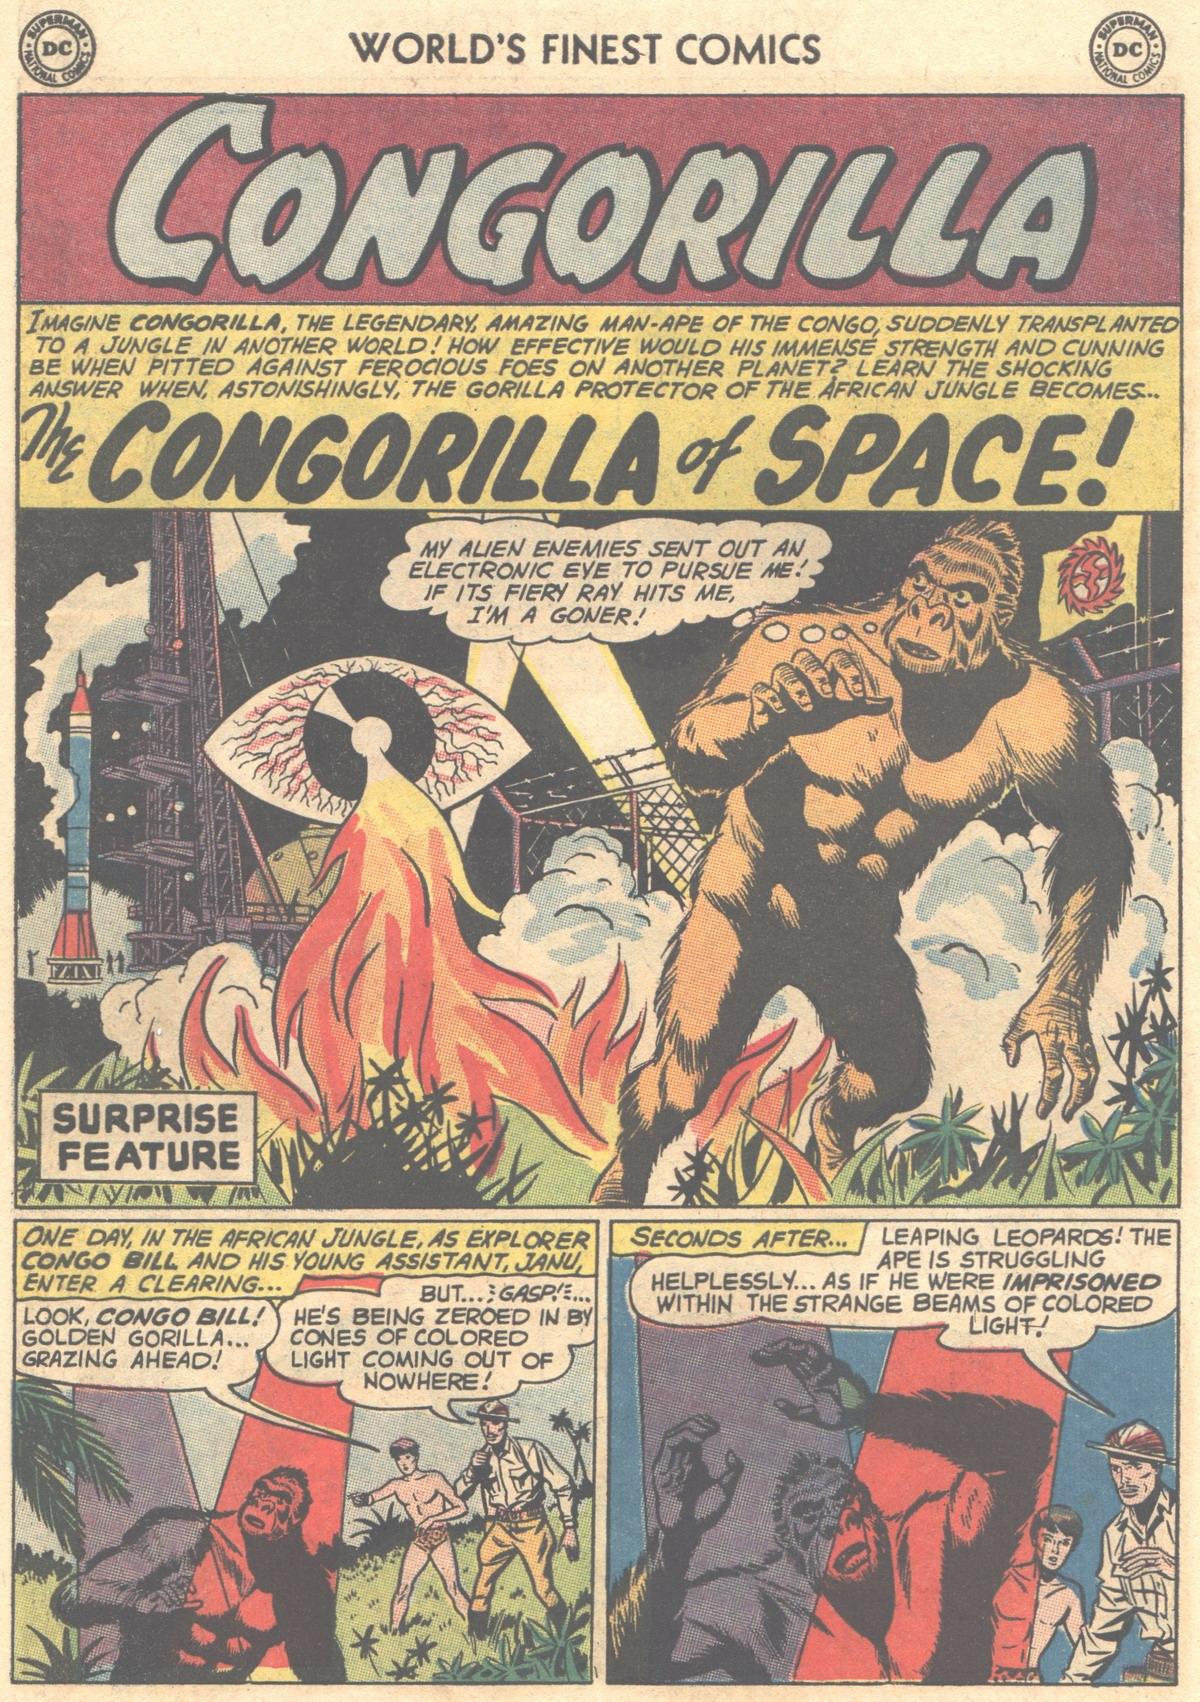 Read online World's Finest Comics comic -  Issue #149 - 26